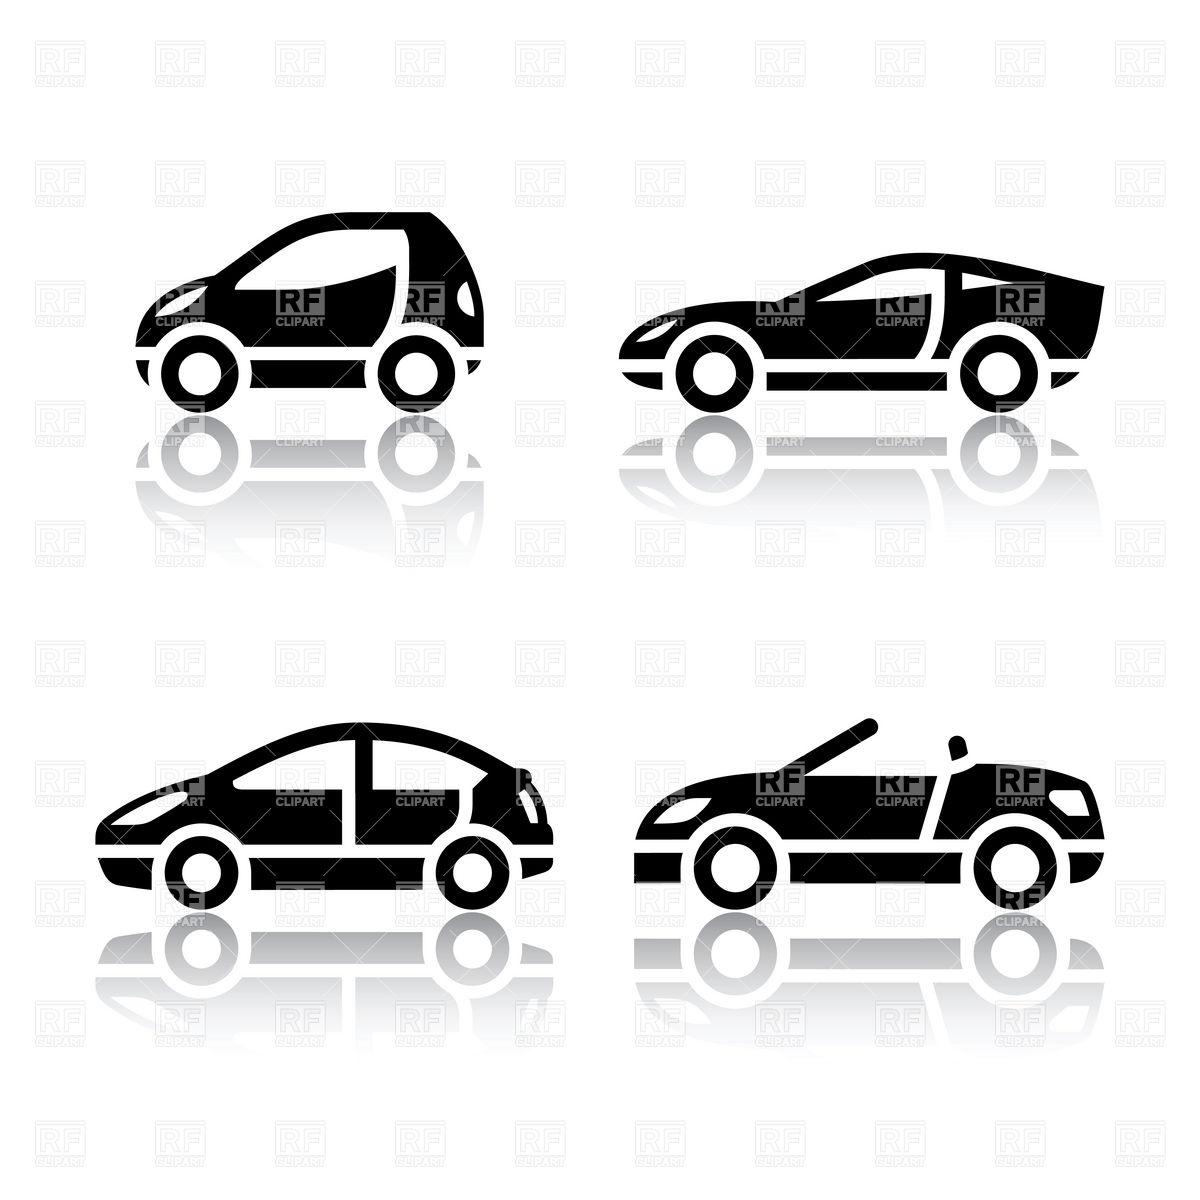 Car's body types.